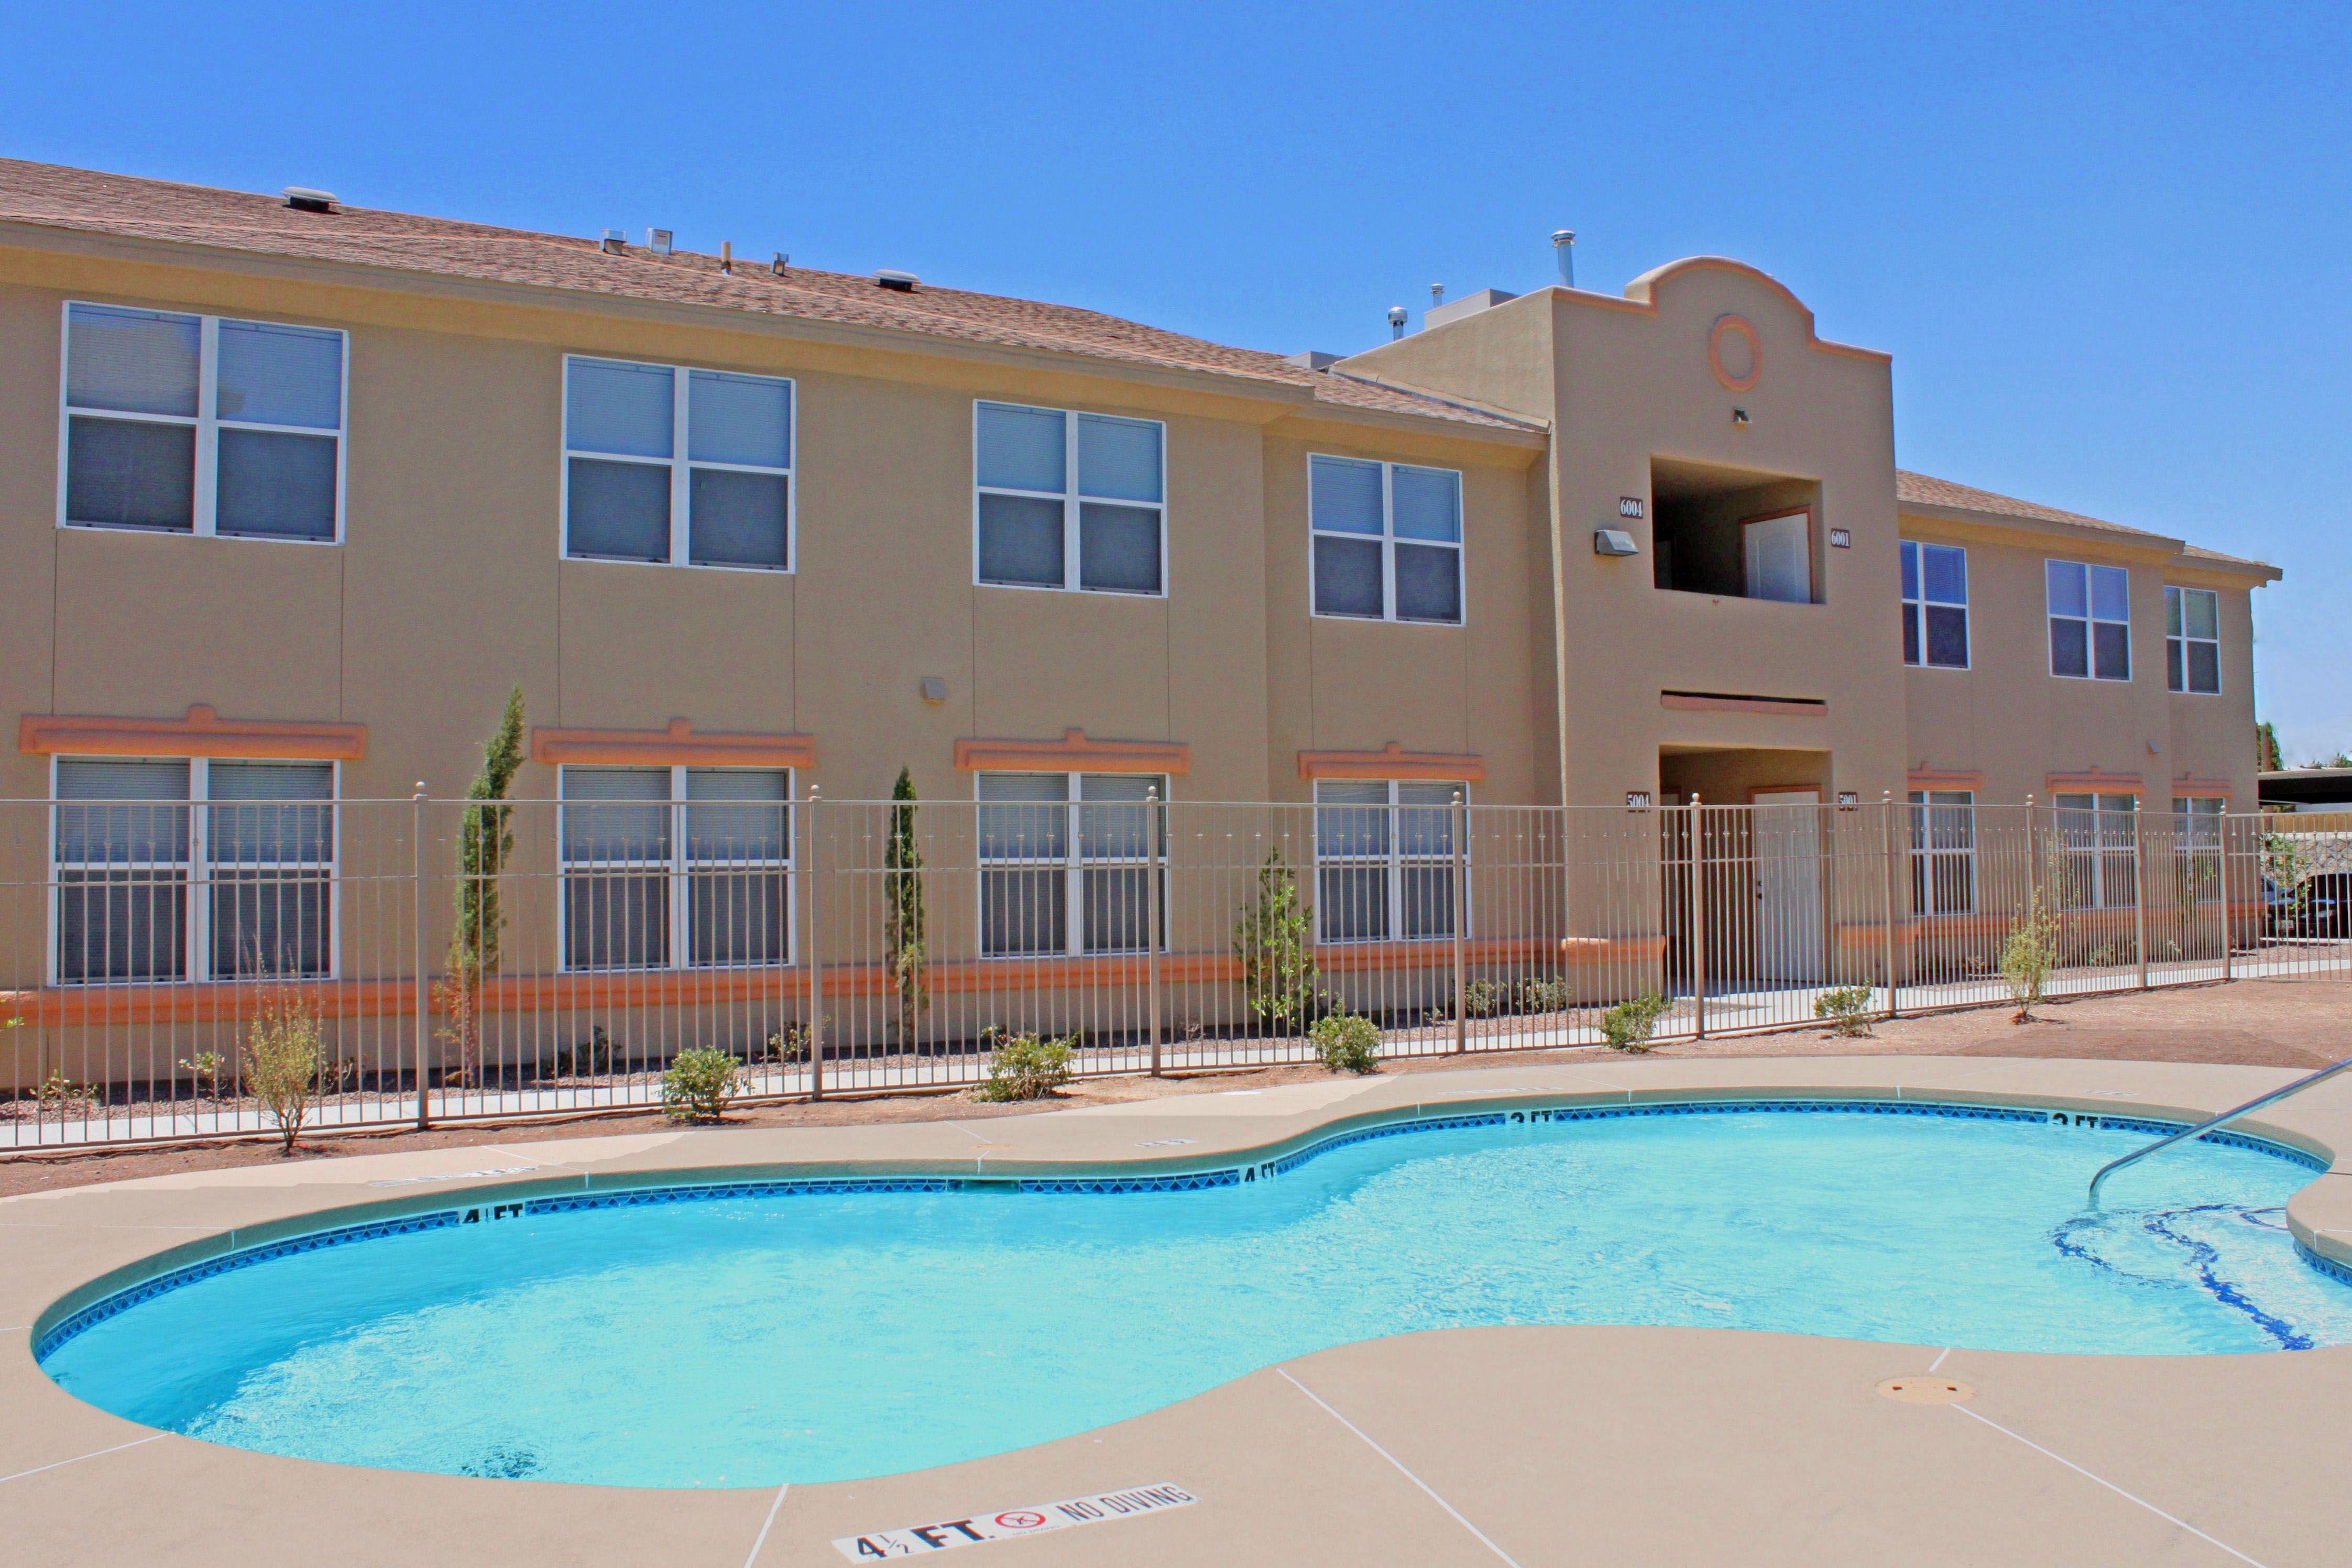 Desert Villas In El Paso Tx Desert Homes Cleveland Apartment House Tours